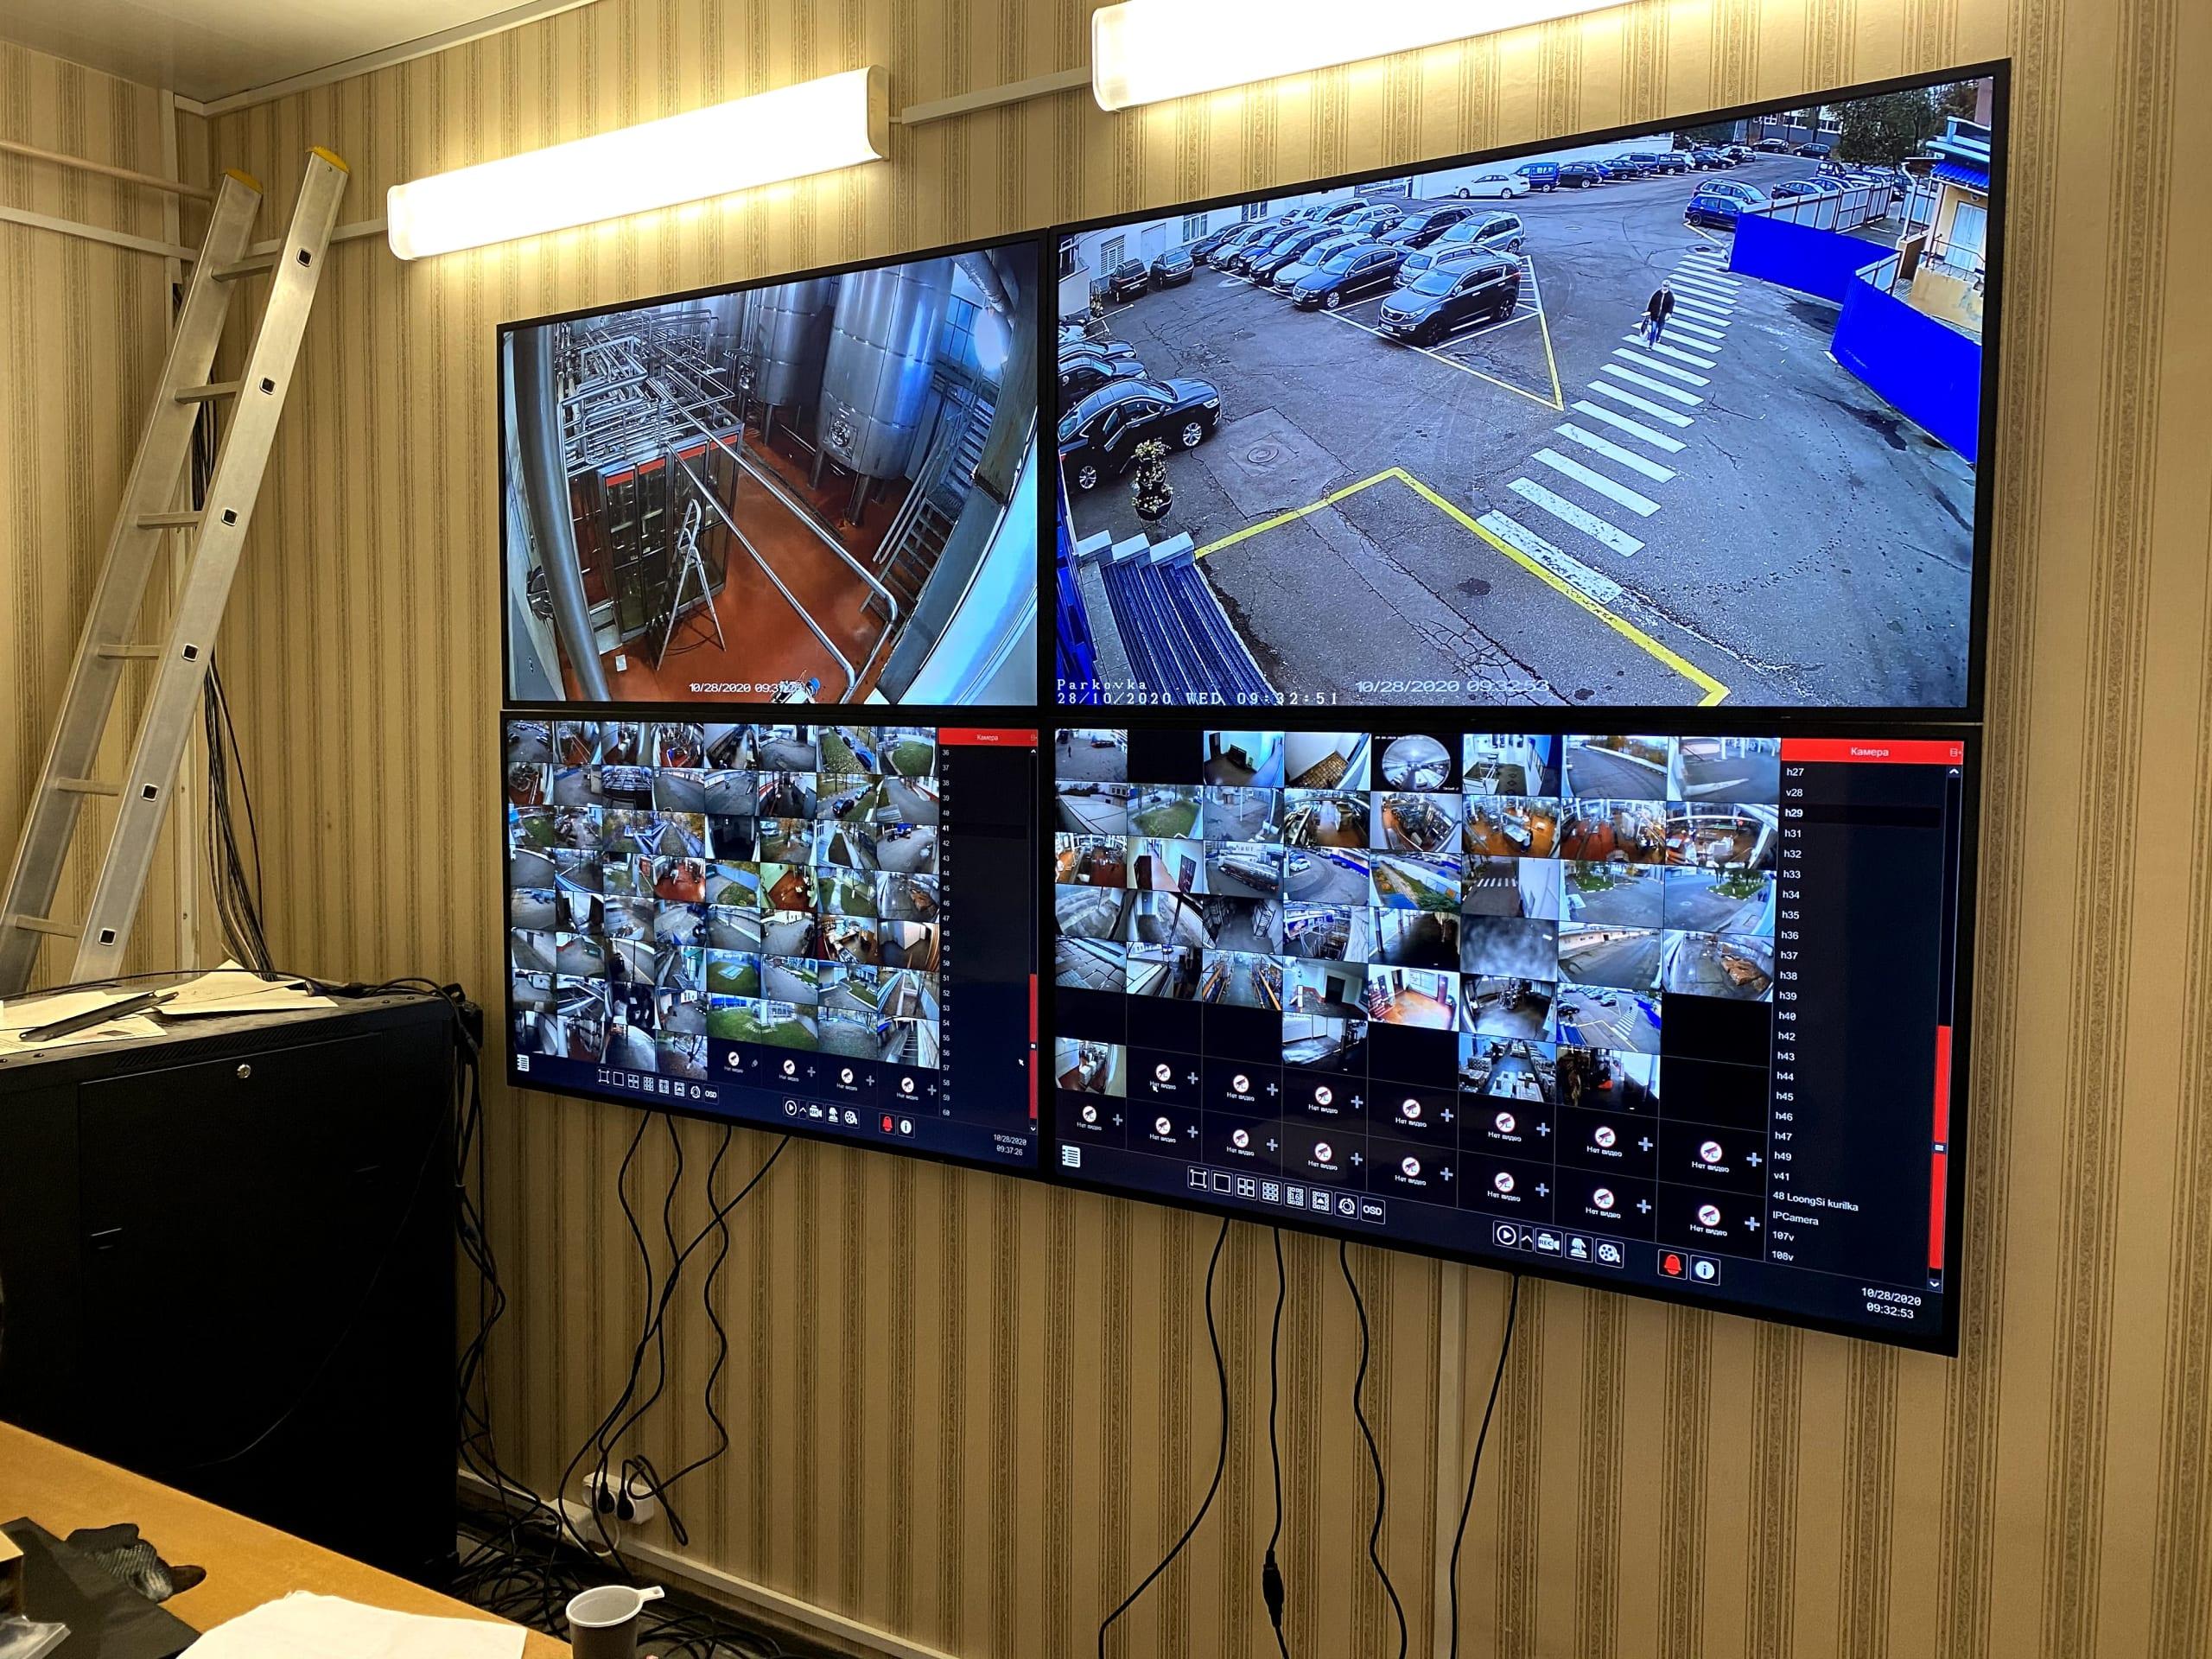 Монитор для контроля за периметром охраняемой территории